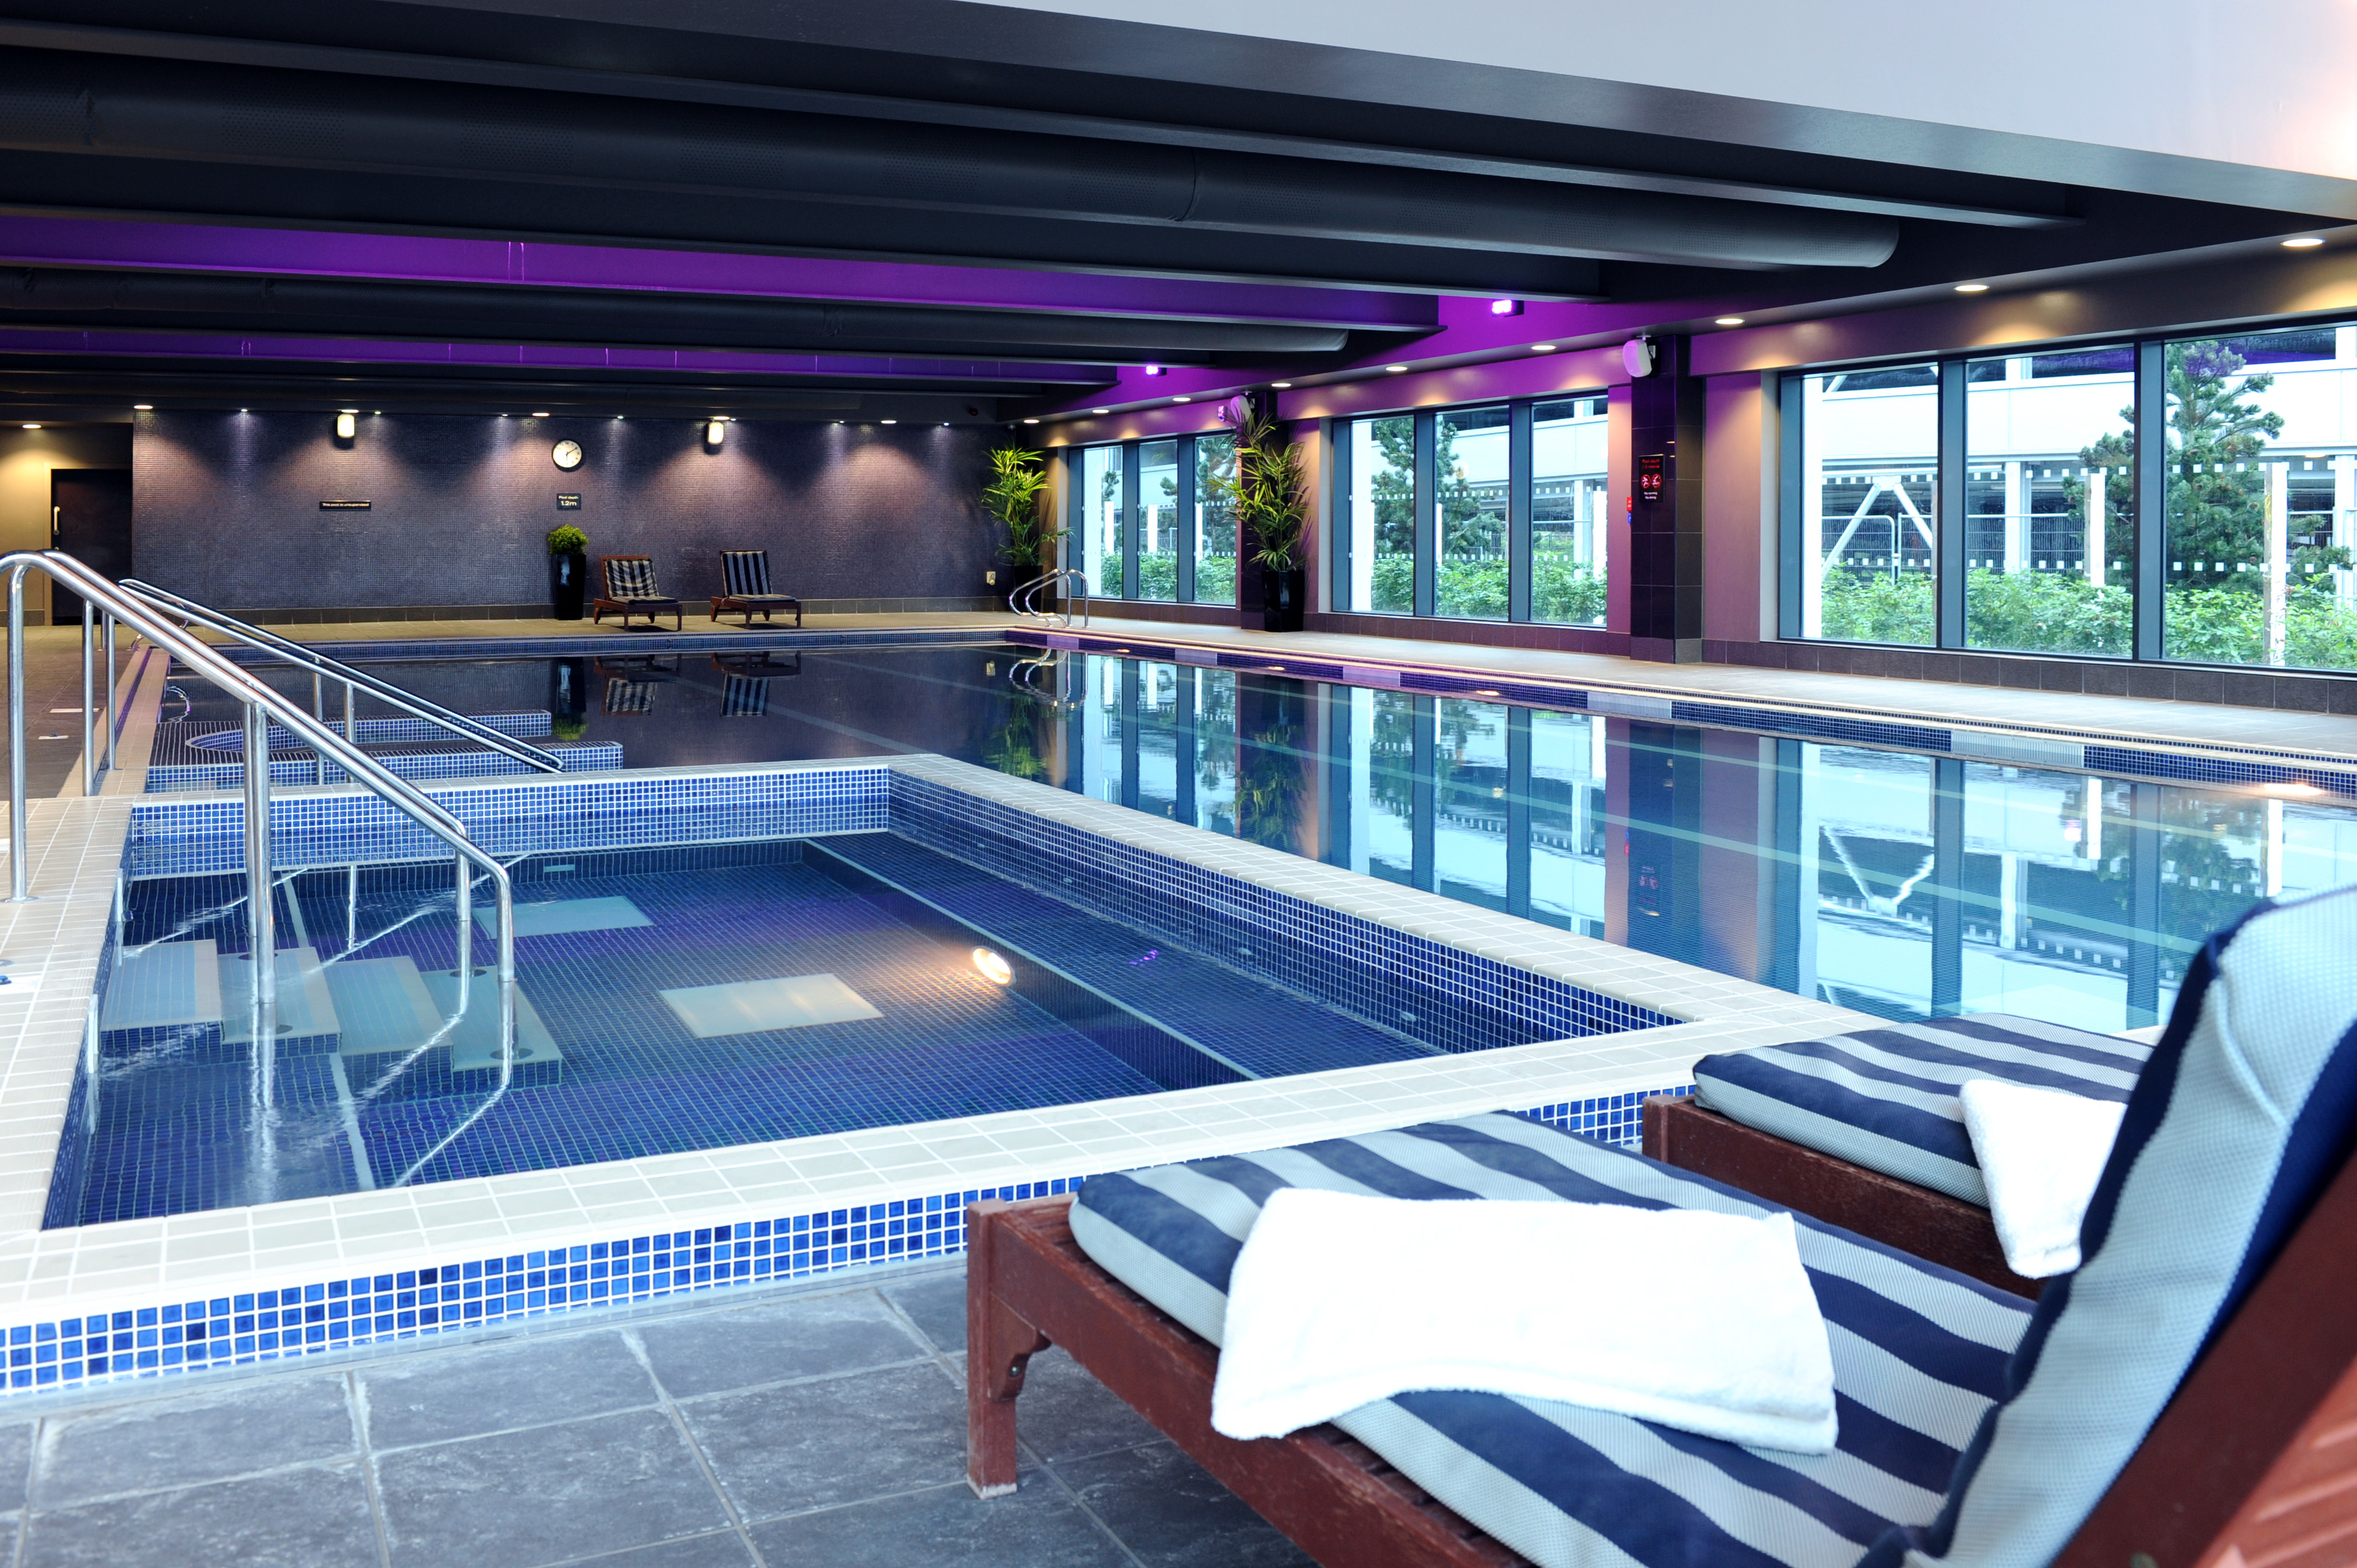 Hotel Openings In Scotland Desouza Associates Venue Of The Season